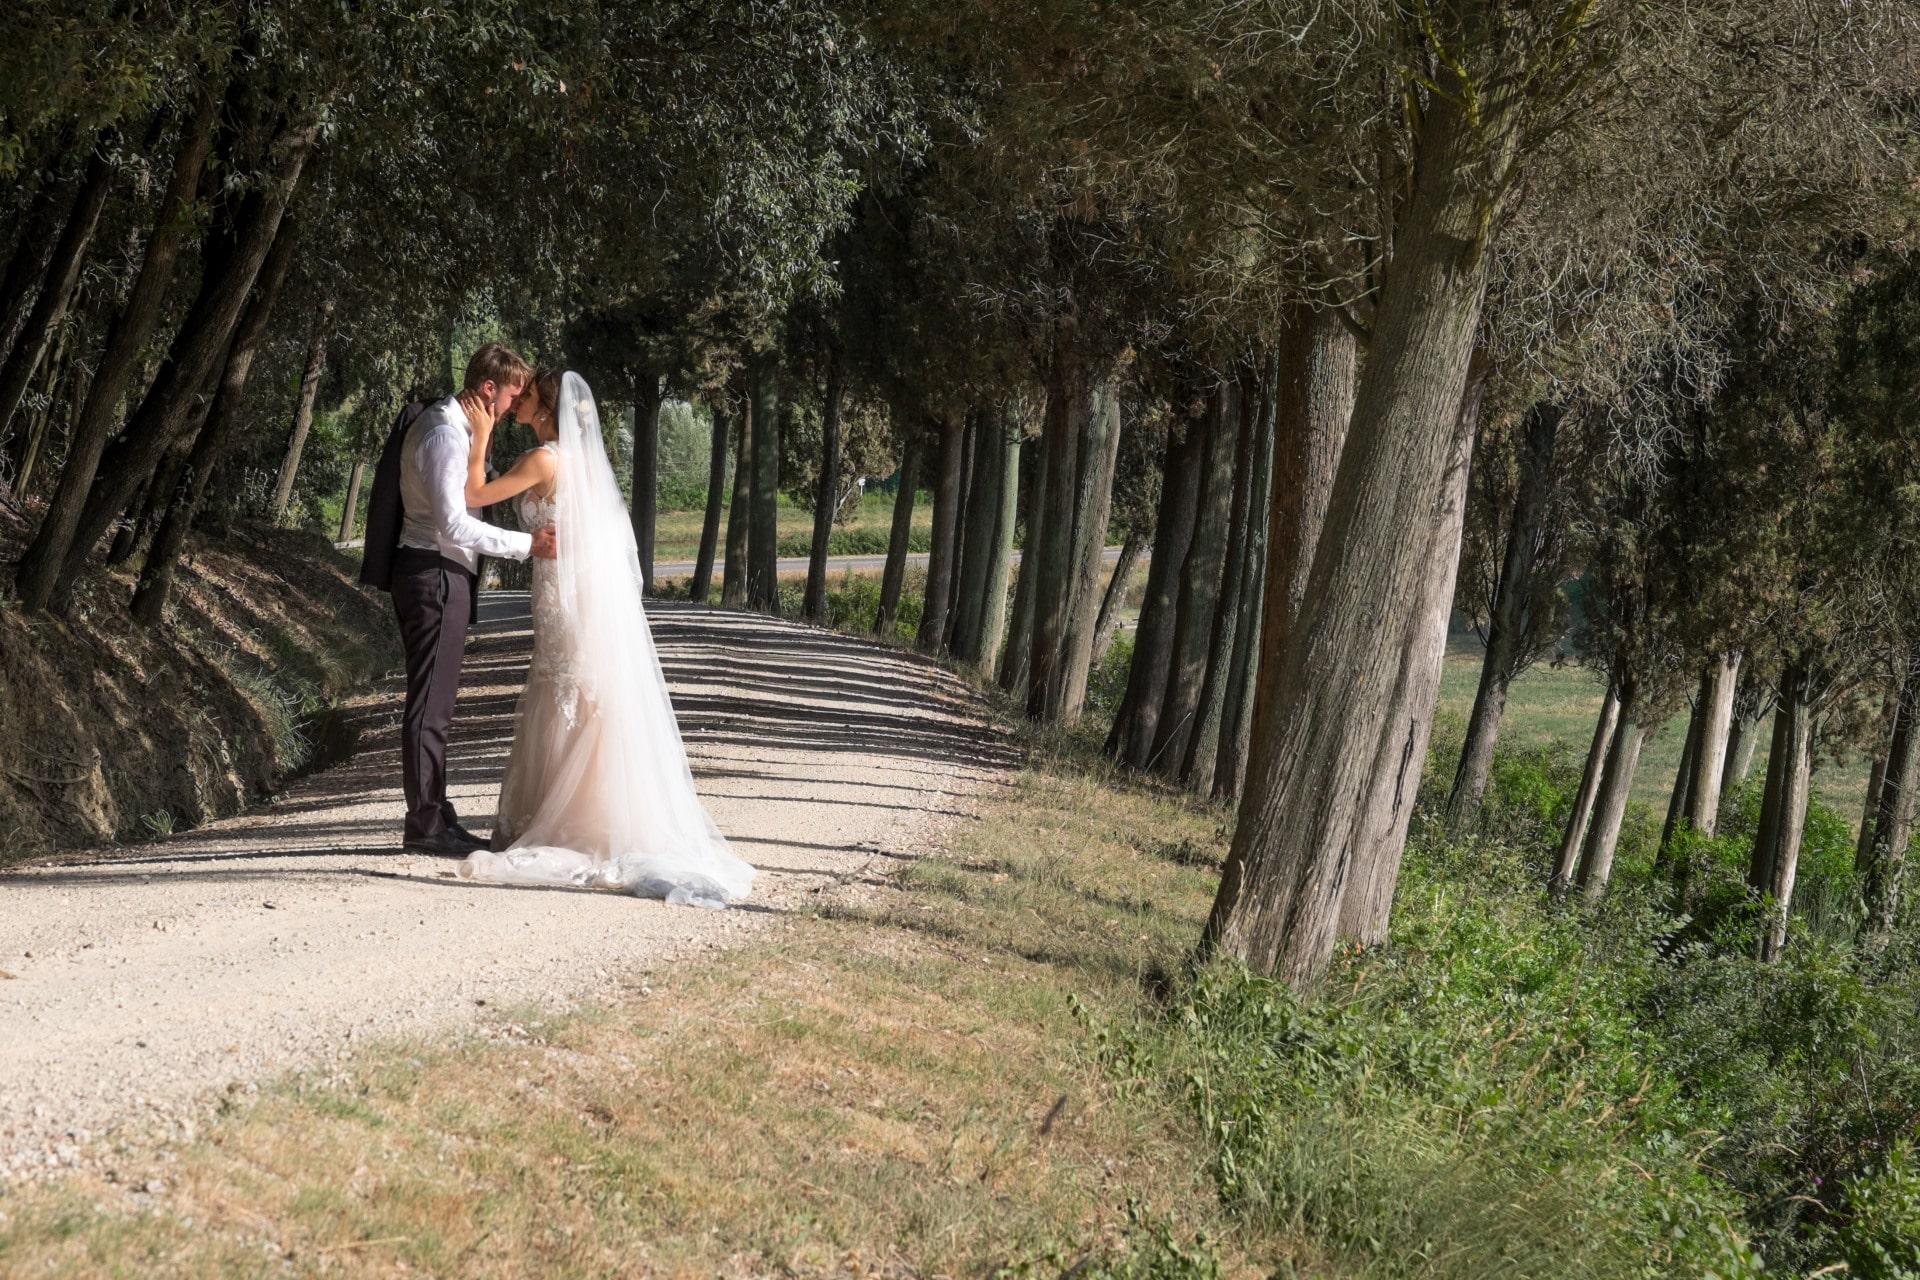 Just Married - Studio Fotografico Livorno background image